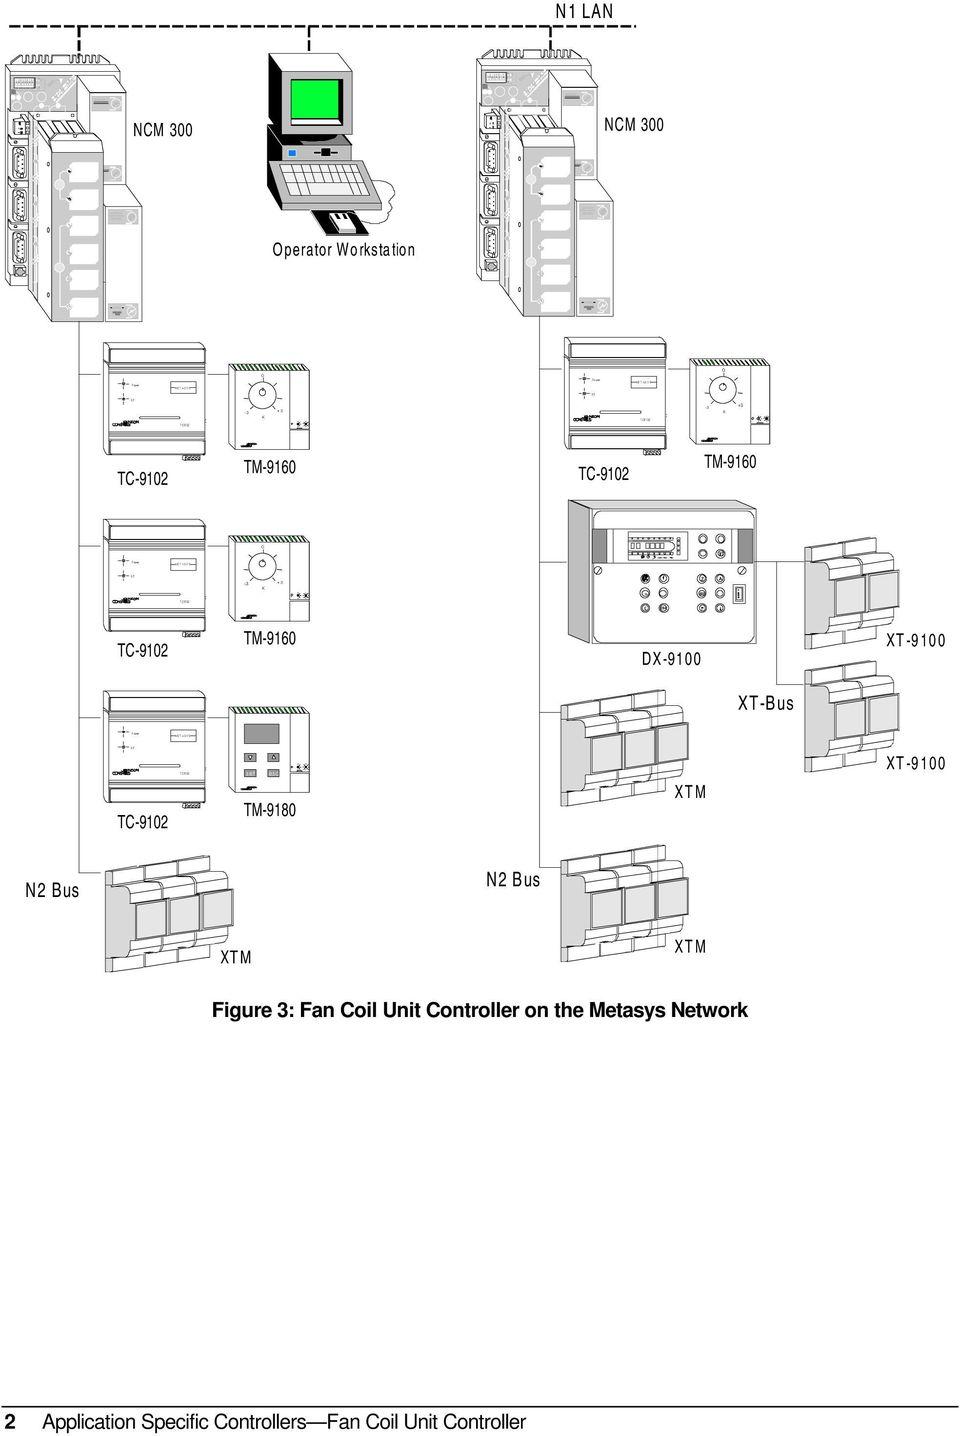 medium resolution of fan coil unit controller pdf 9102 metasys tc wiring diagram